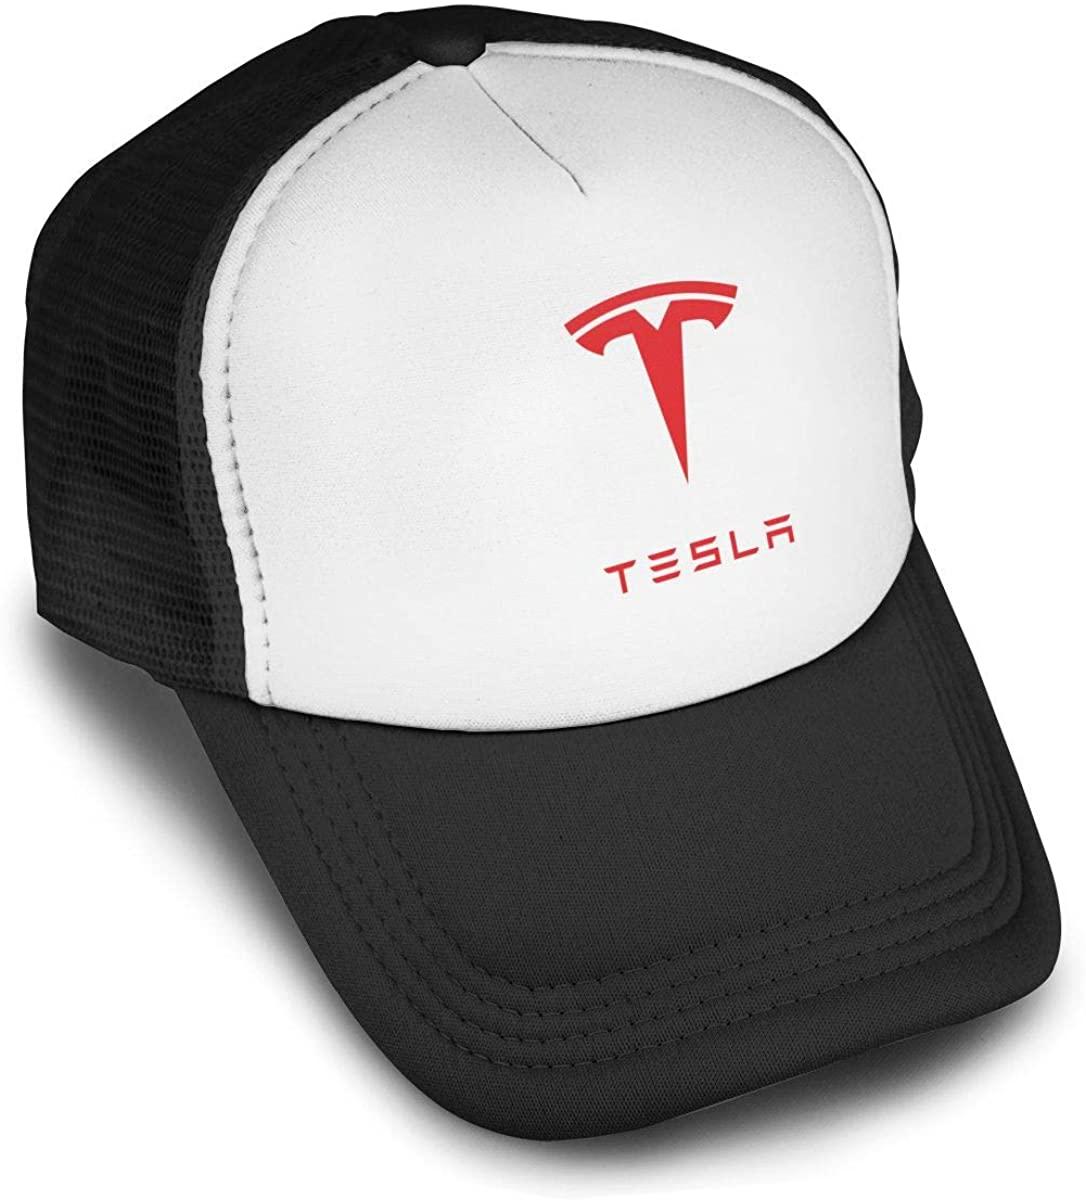 New Tesla Auto Logo Baseball Cap Adjustable Hip Hop Flat Hats Men Womens Cool Peaked Trucker Hats